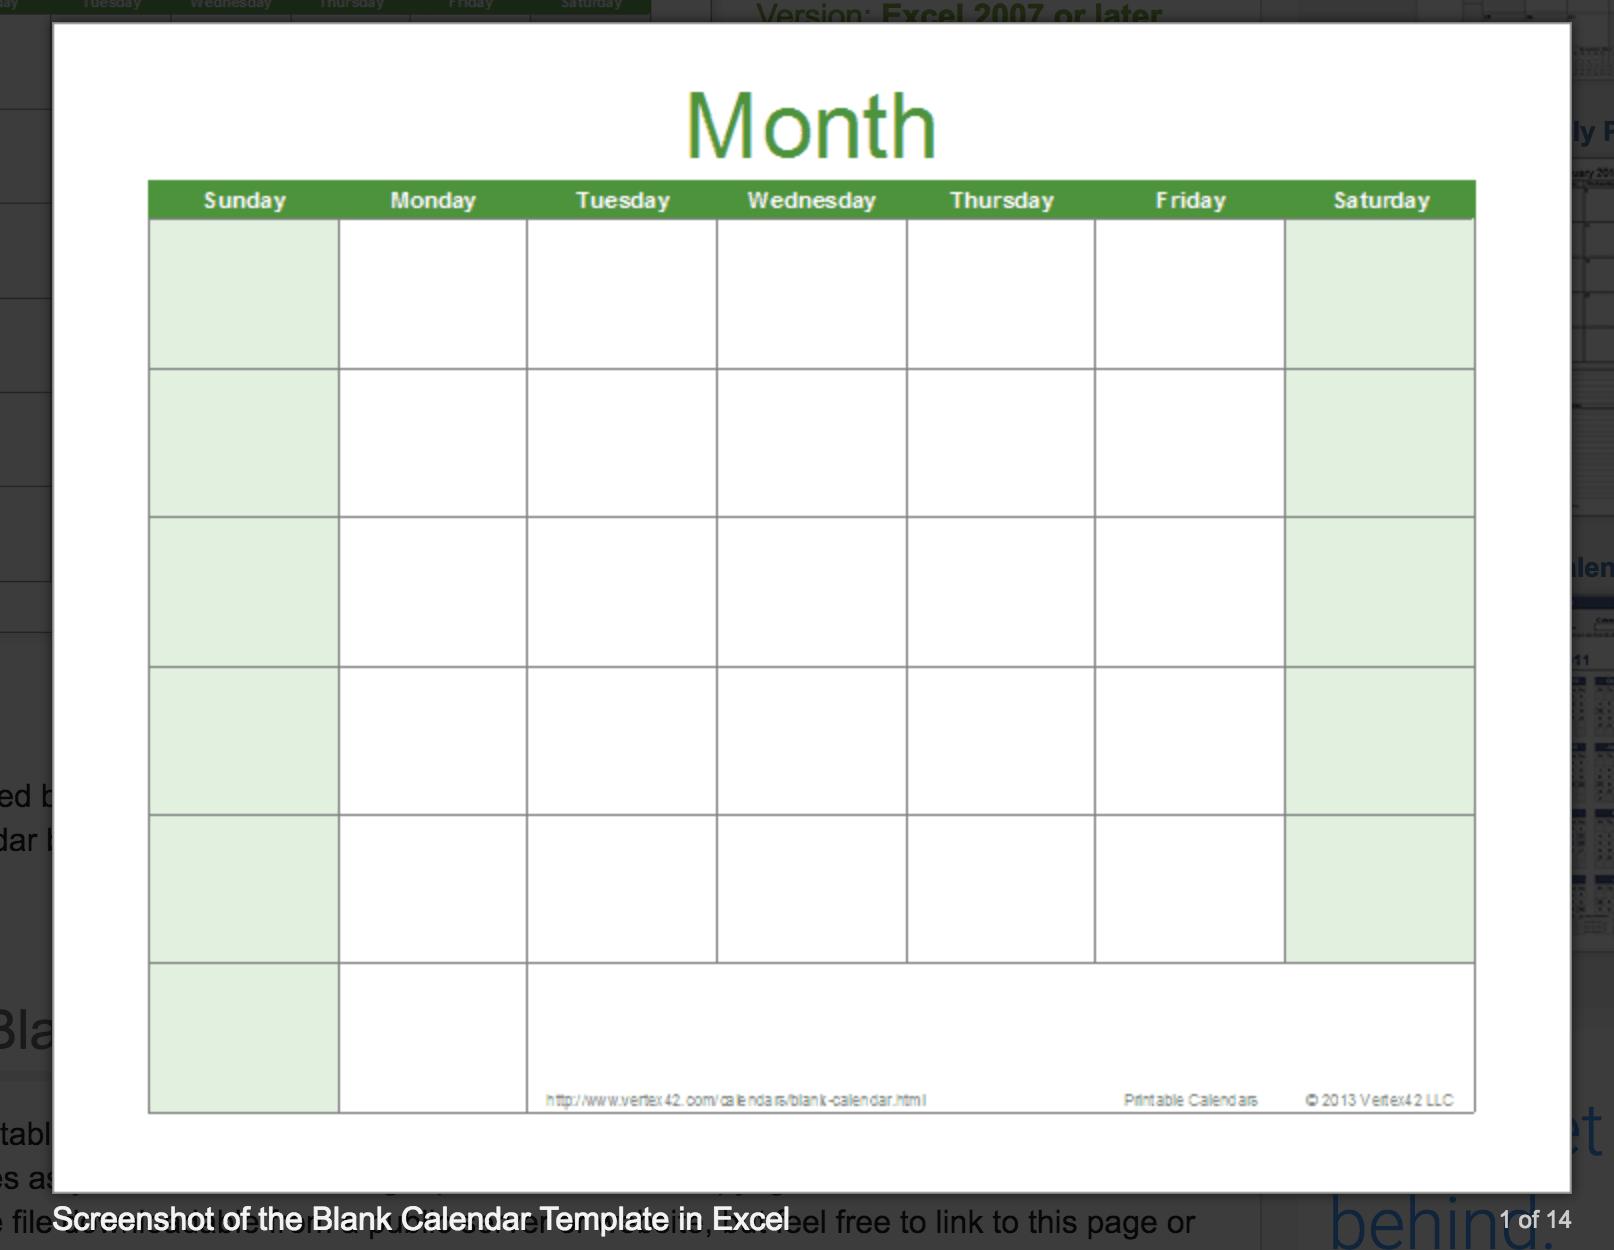 Blank Calendar: Wonderfully Printable 2019 Templates inside Free Excel Calendar Templates